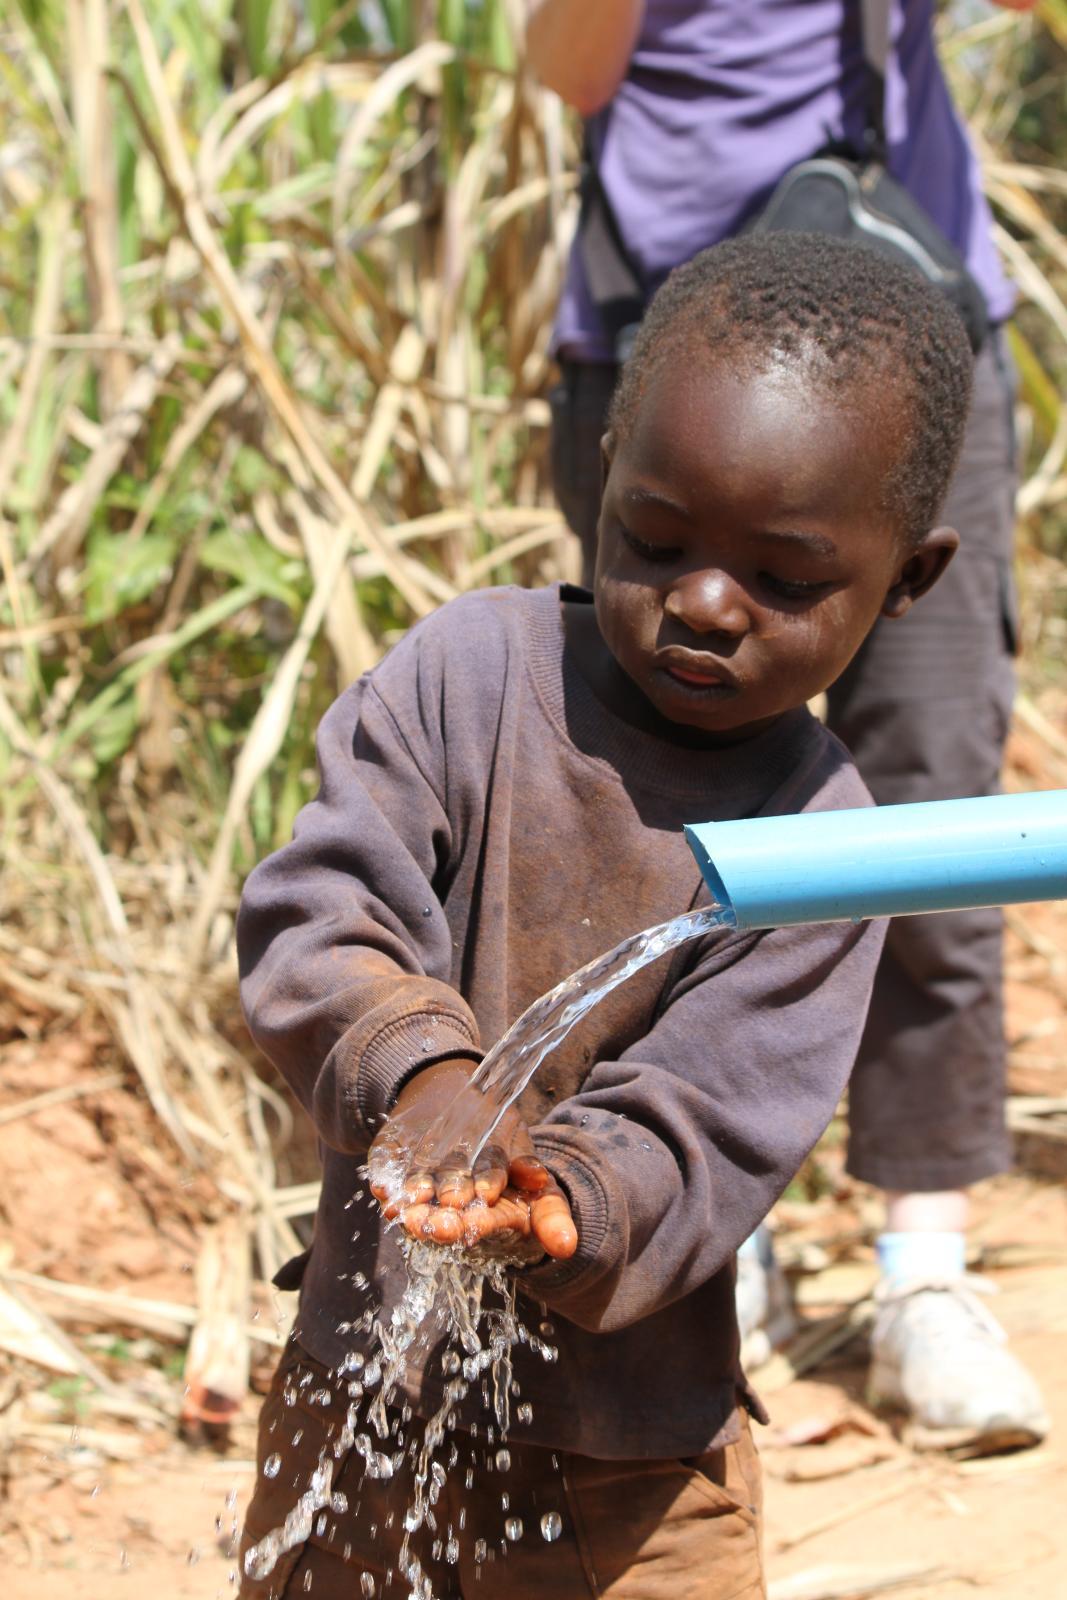 boy washes hands at pump